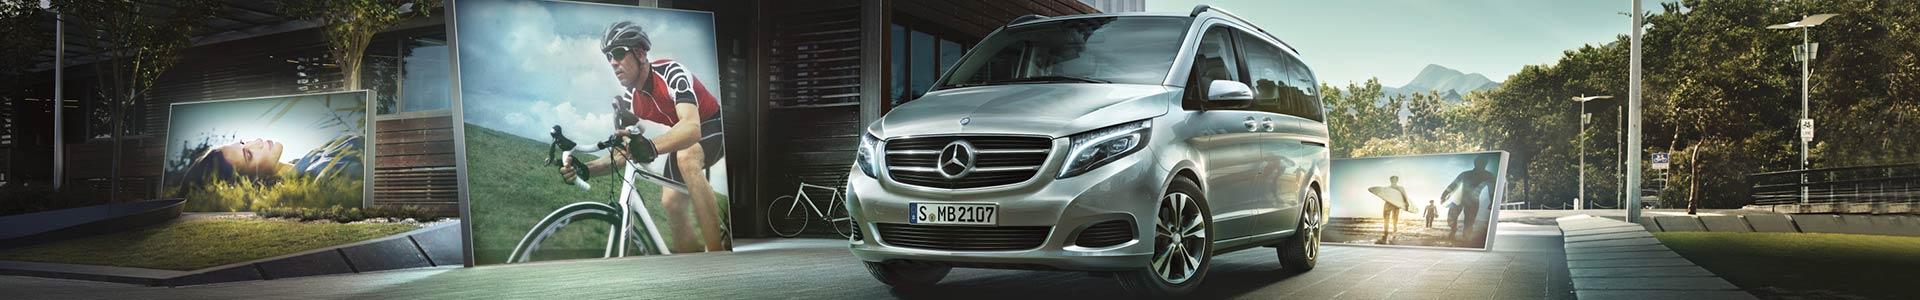 Mercedes-Benz V-Klasse